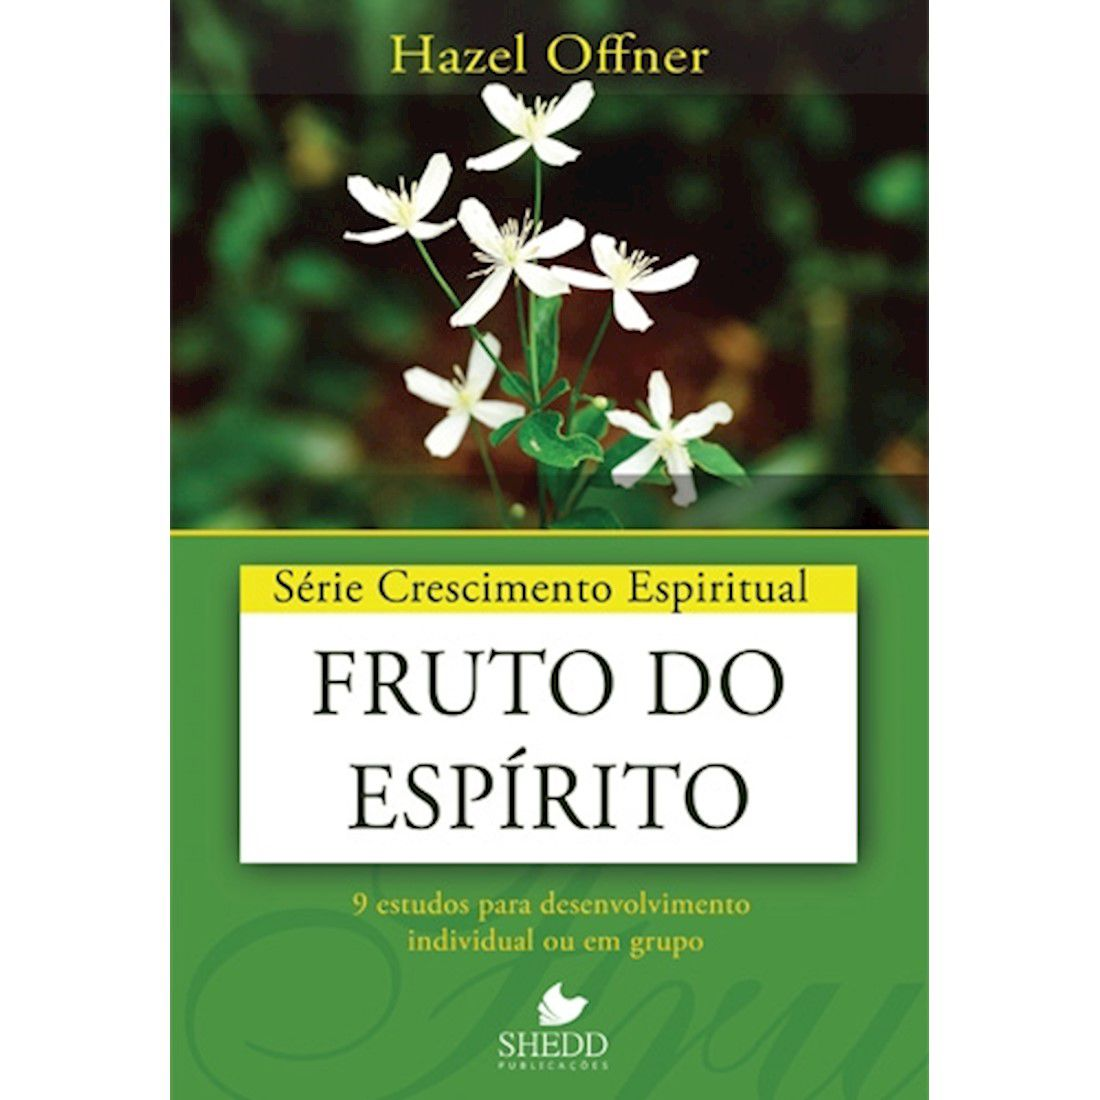 Livro Série Crescimento Espiritual - Fruto do Espírito